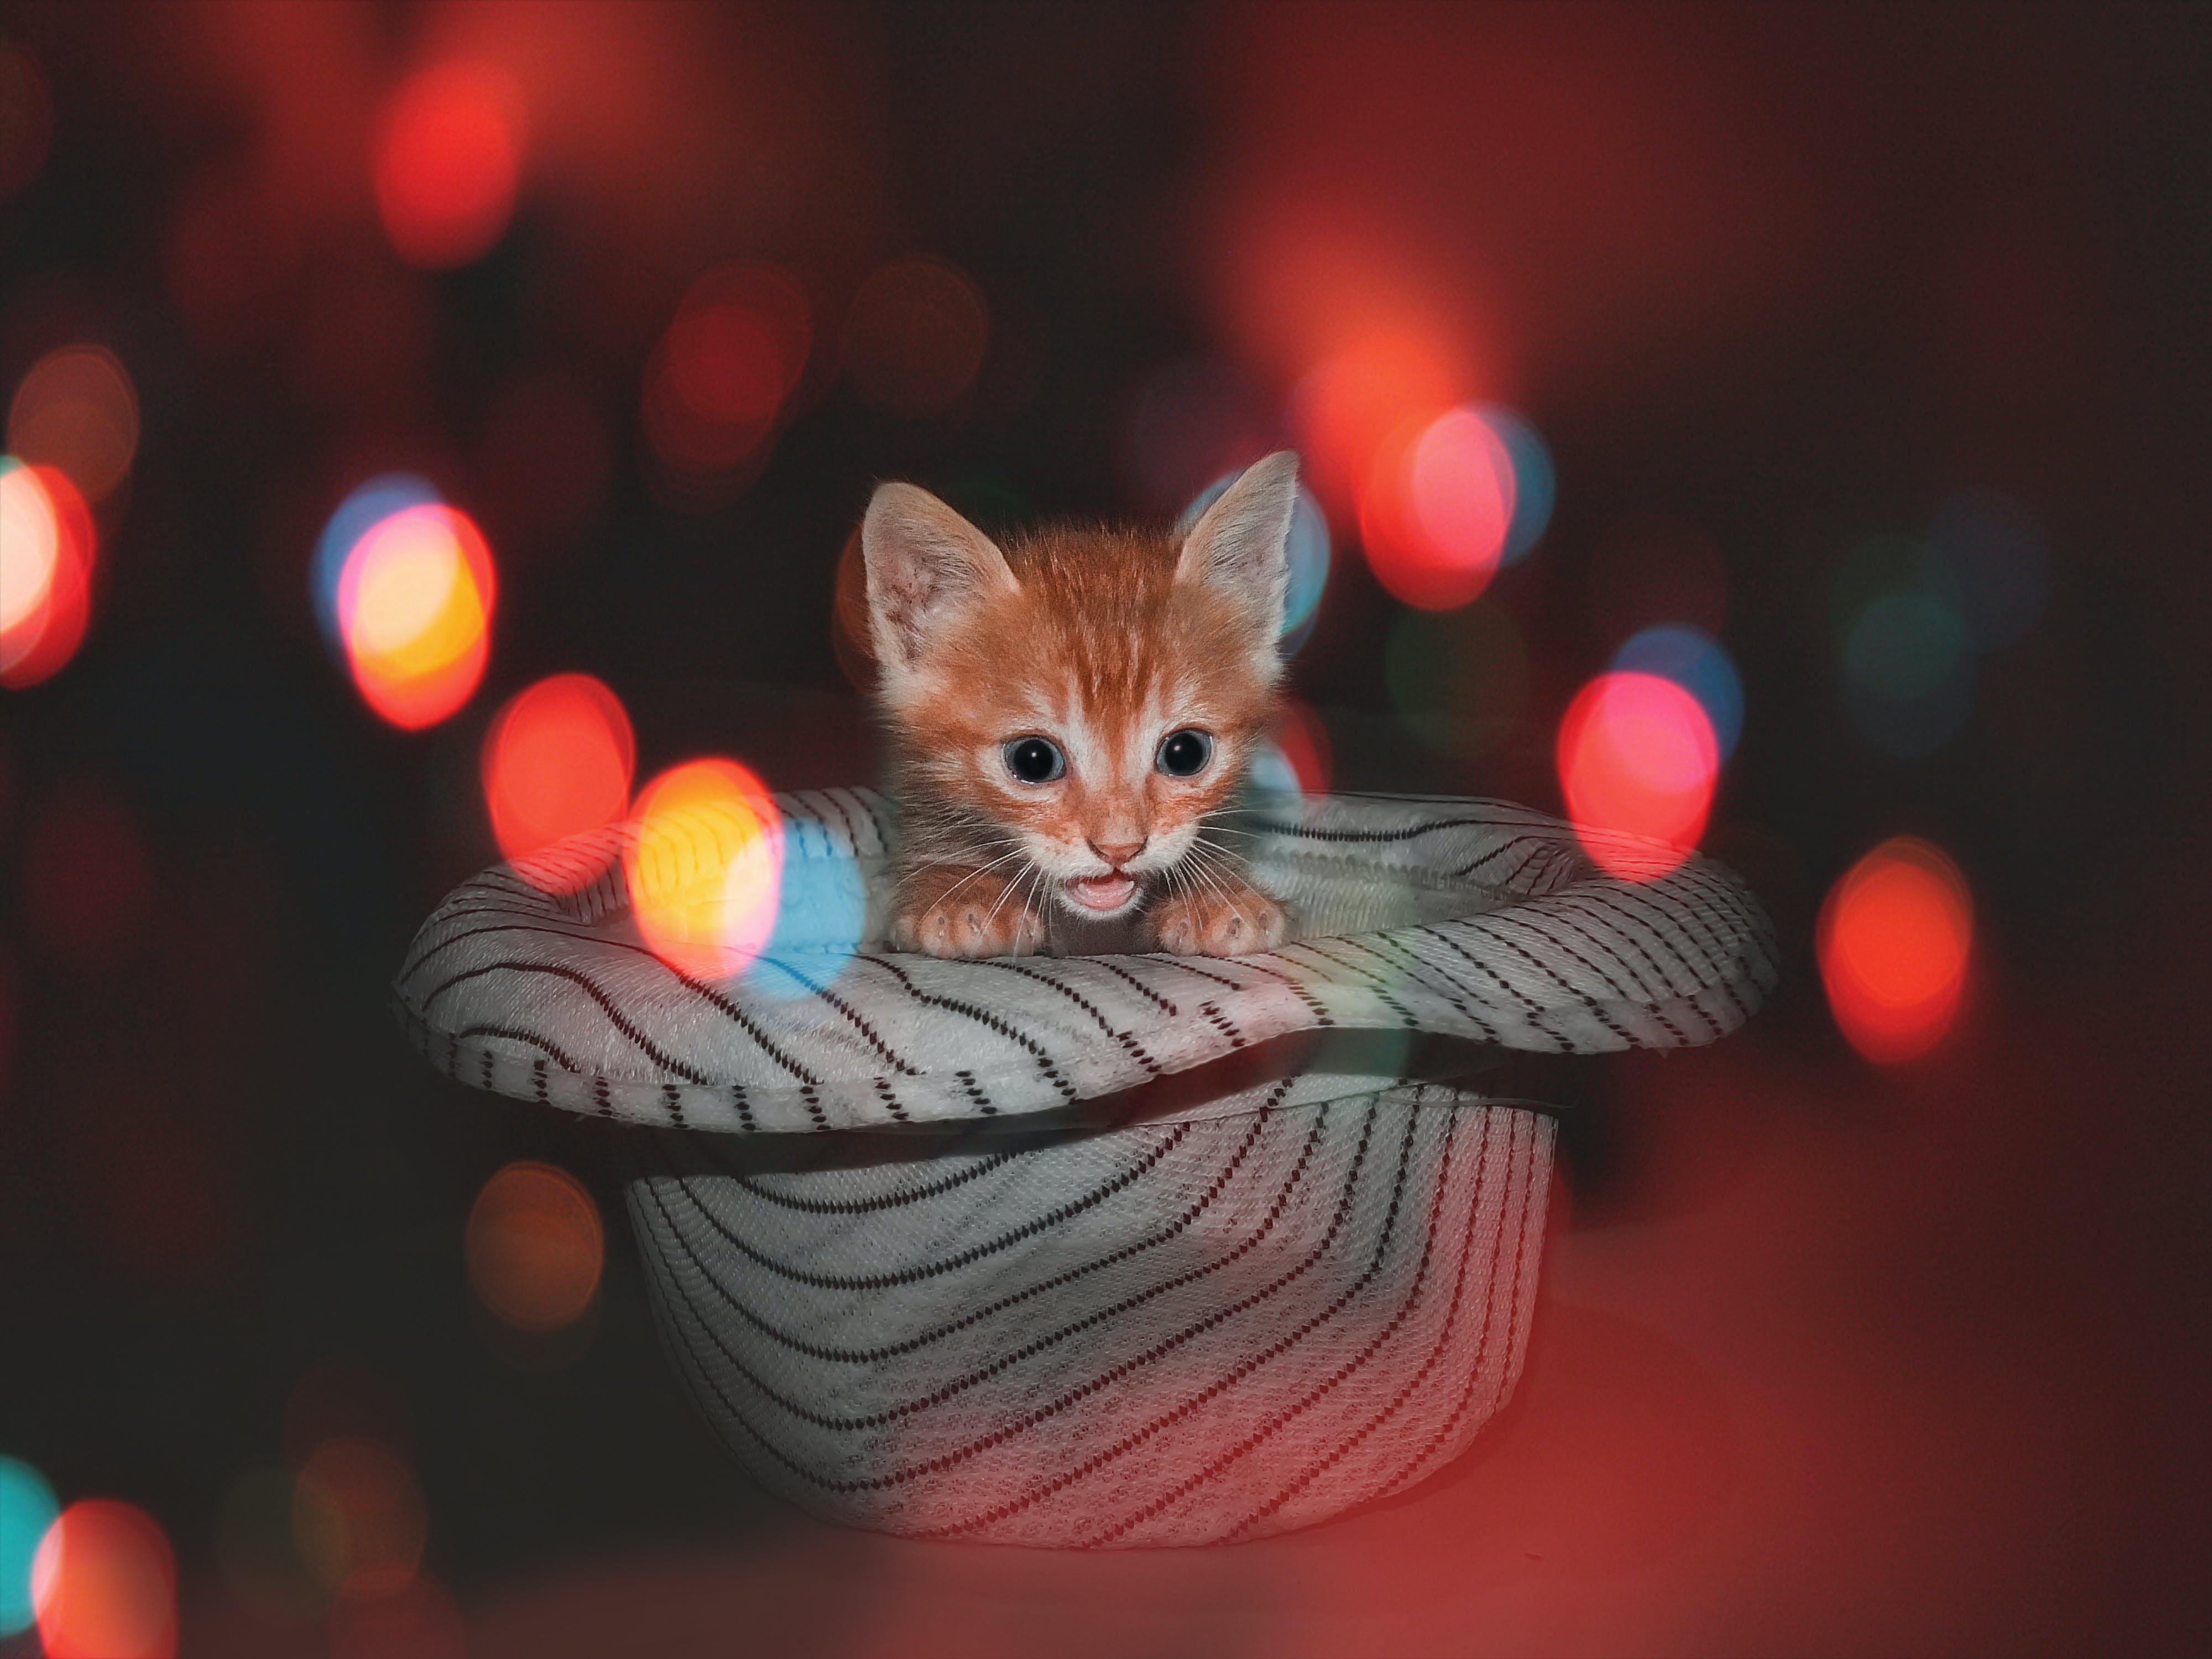 Free stock photo of animal lover, animal photography, animal portrait, cat